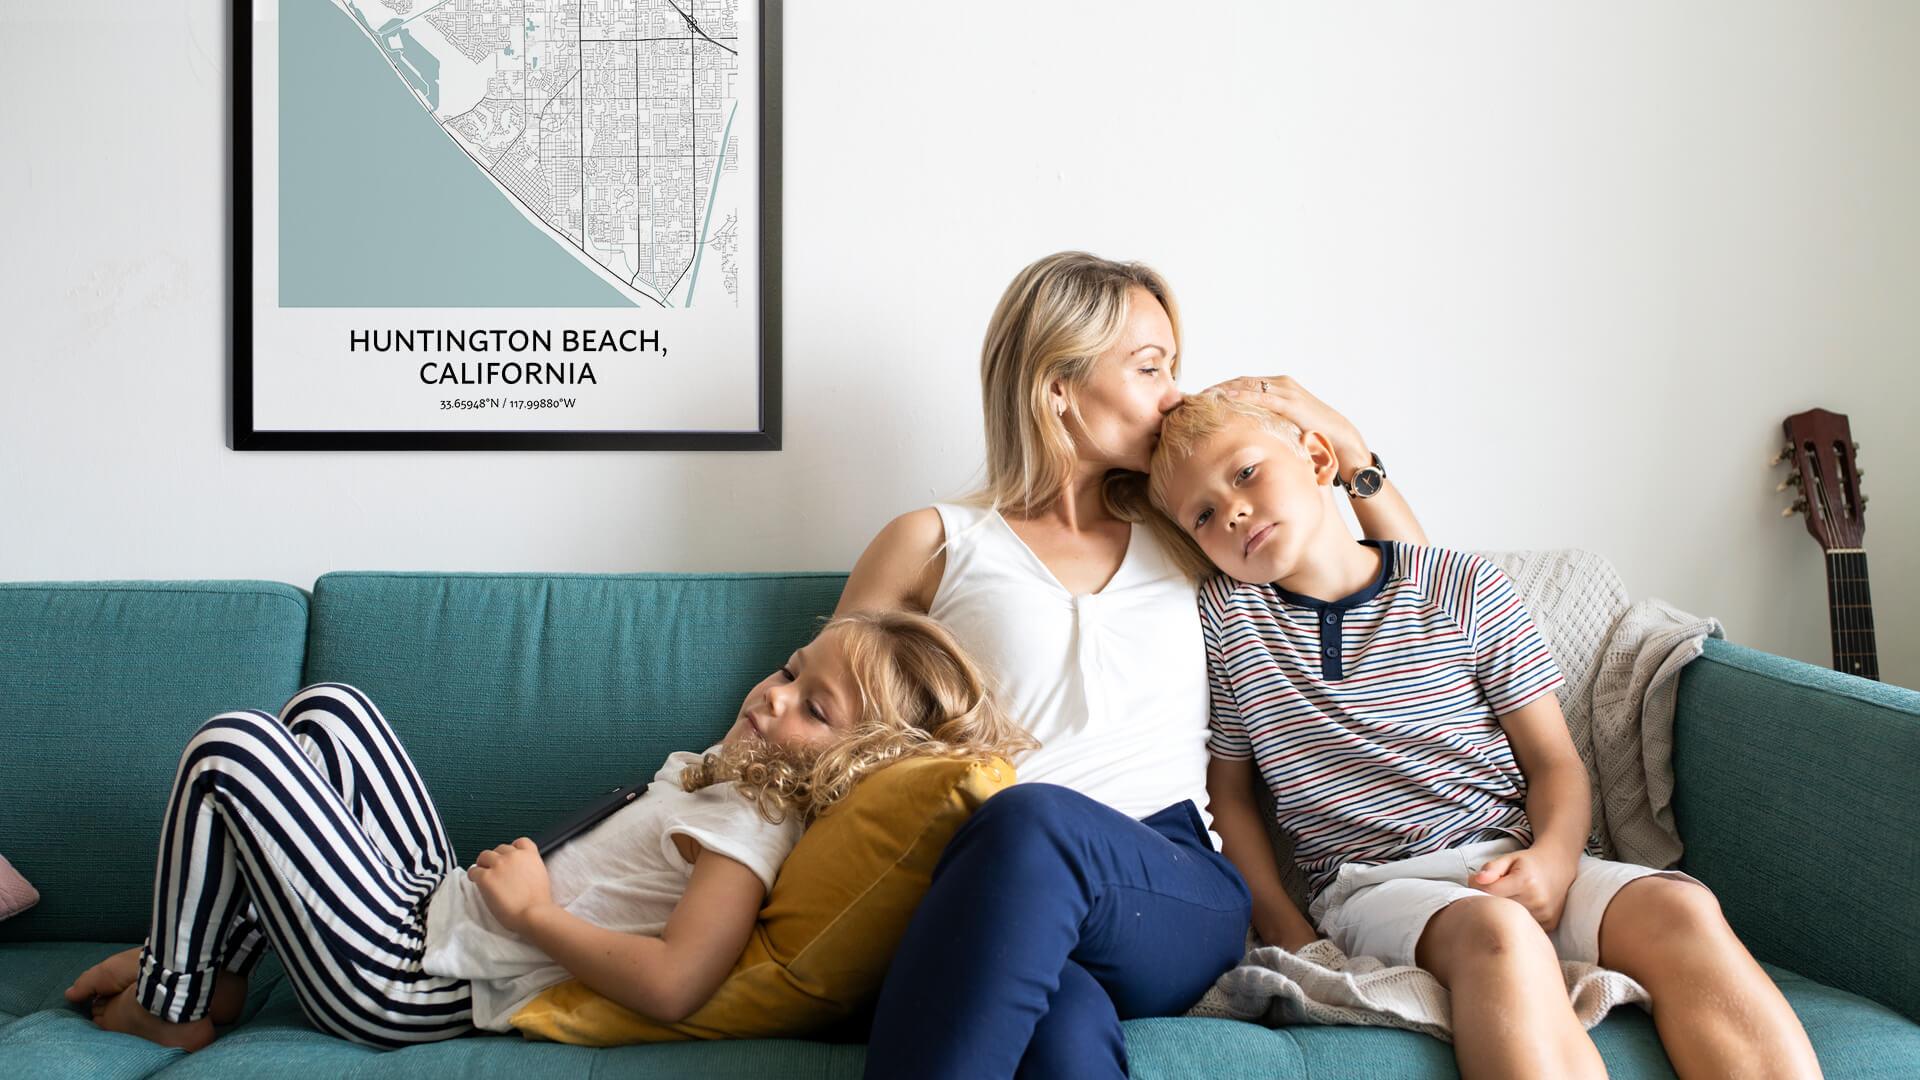 Huntington Beach map poster